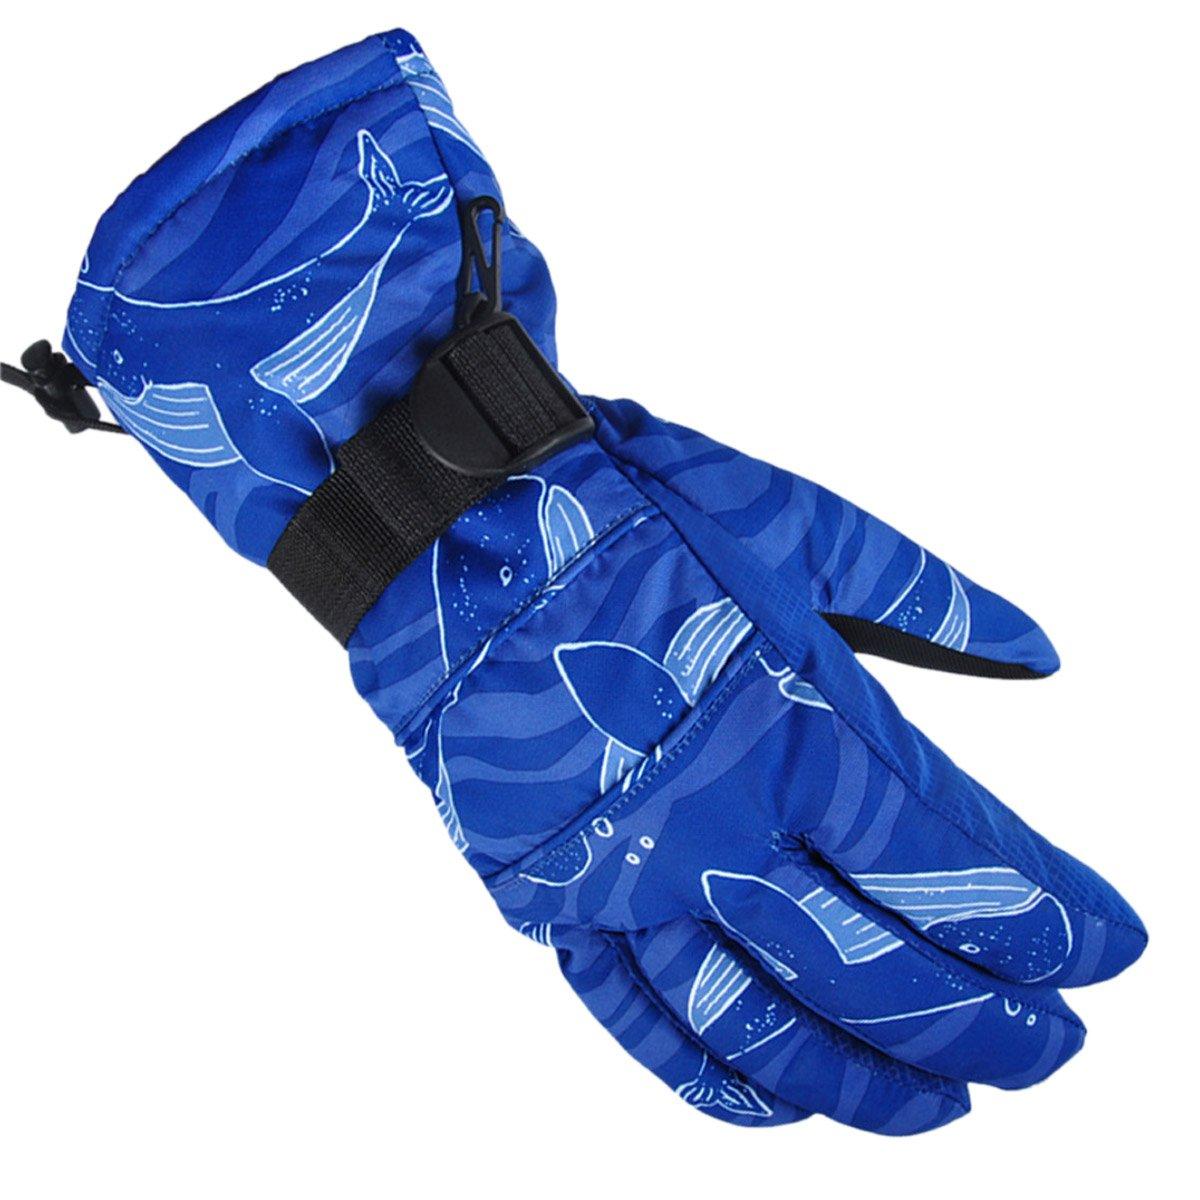 Men's Skiing Snowboarding Wrist Guard Gloves Winter Heated